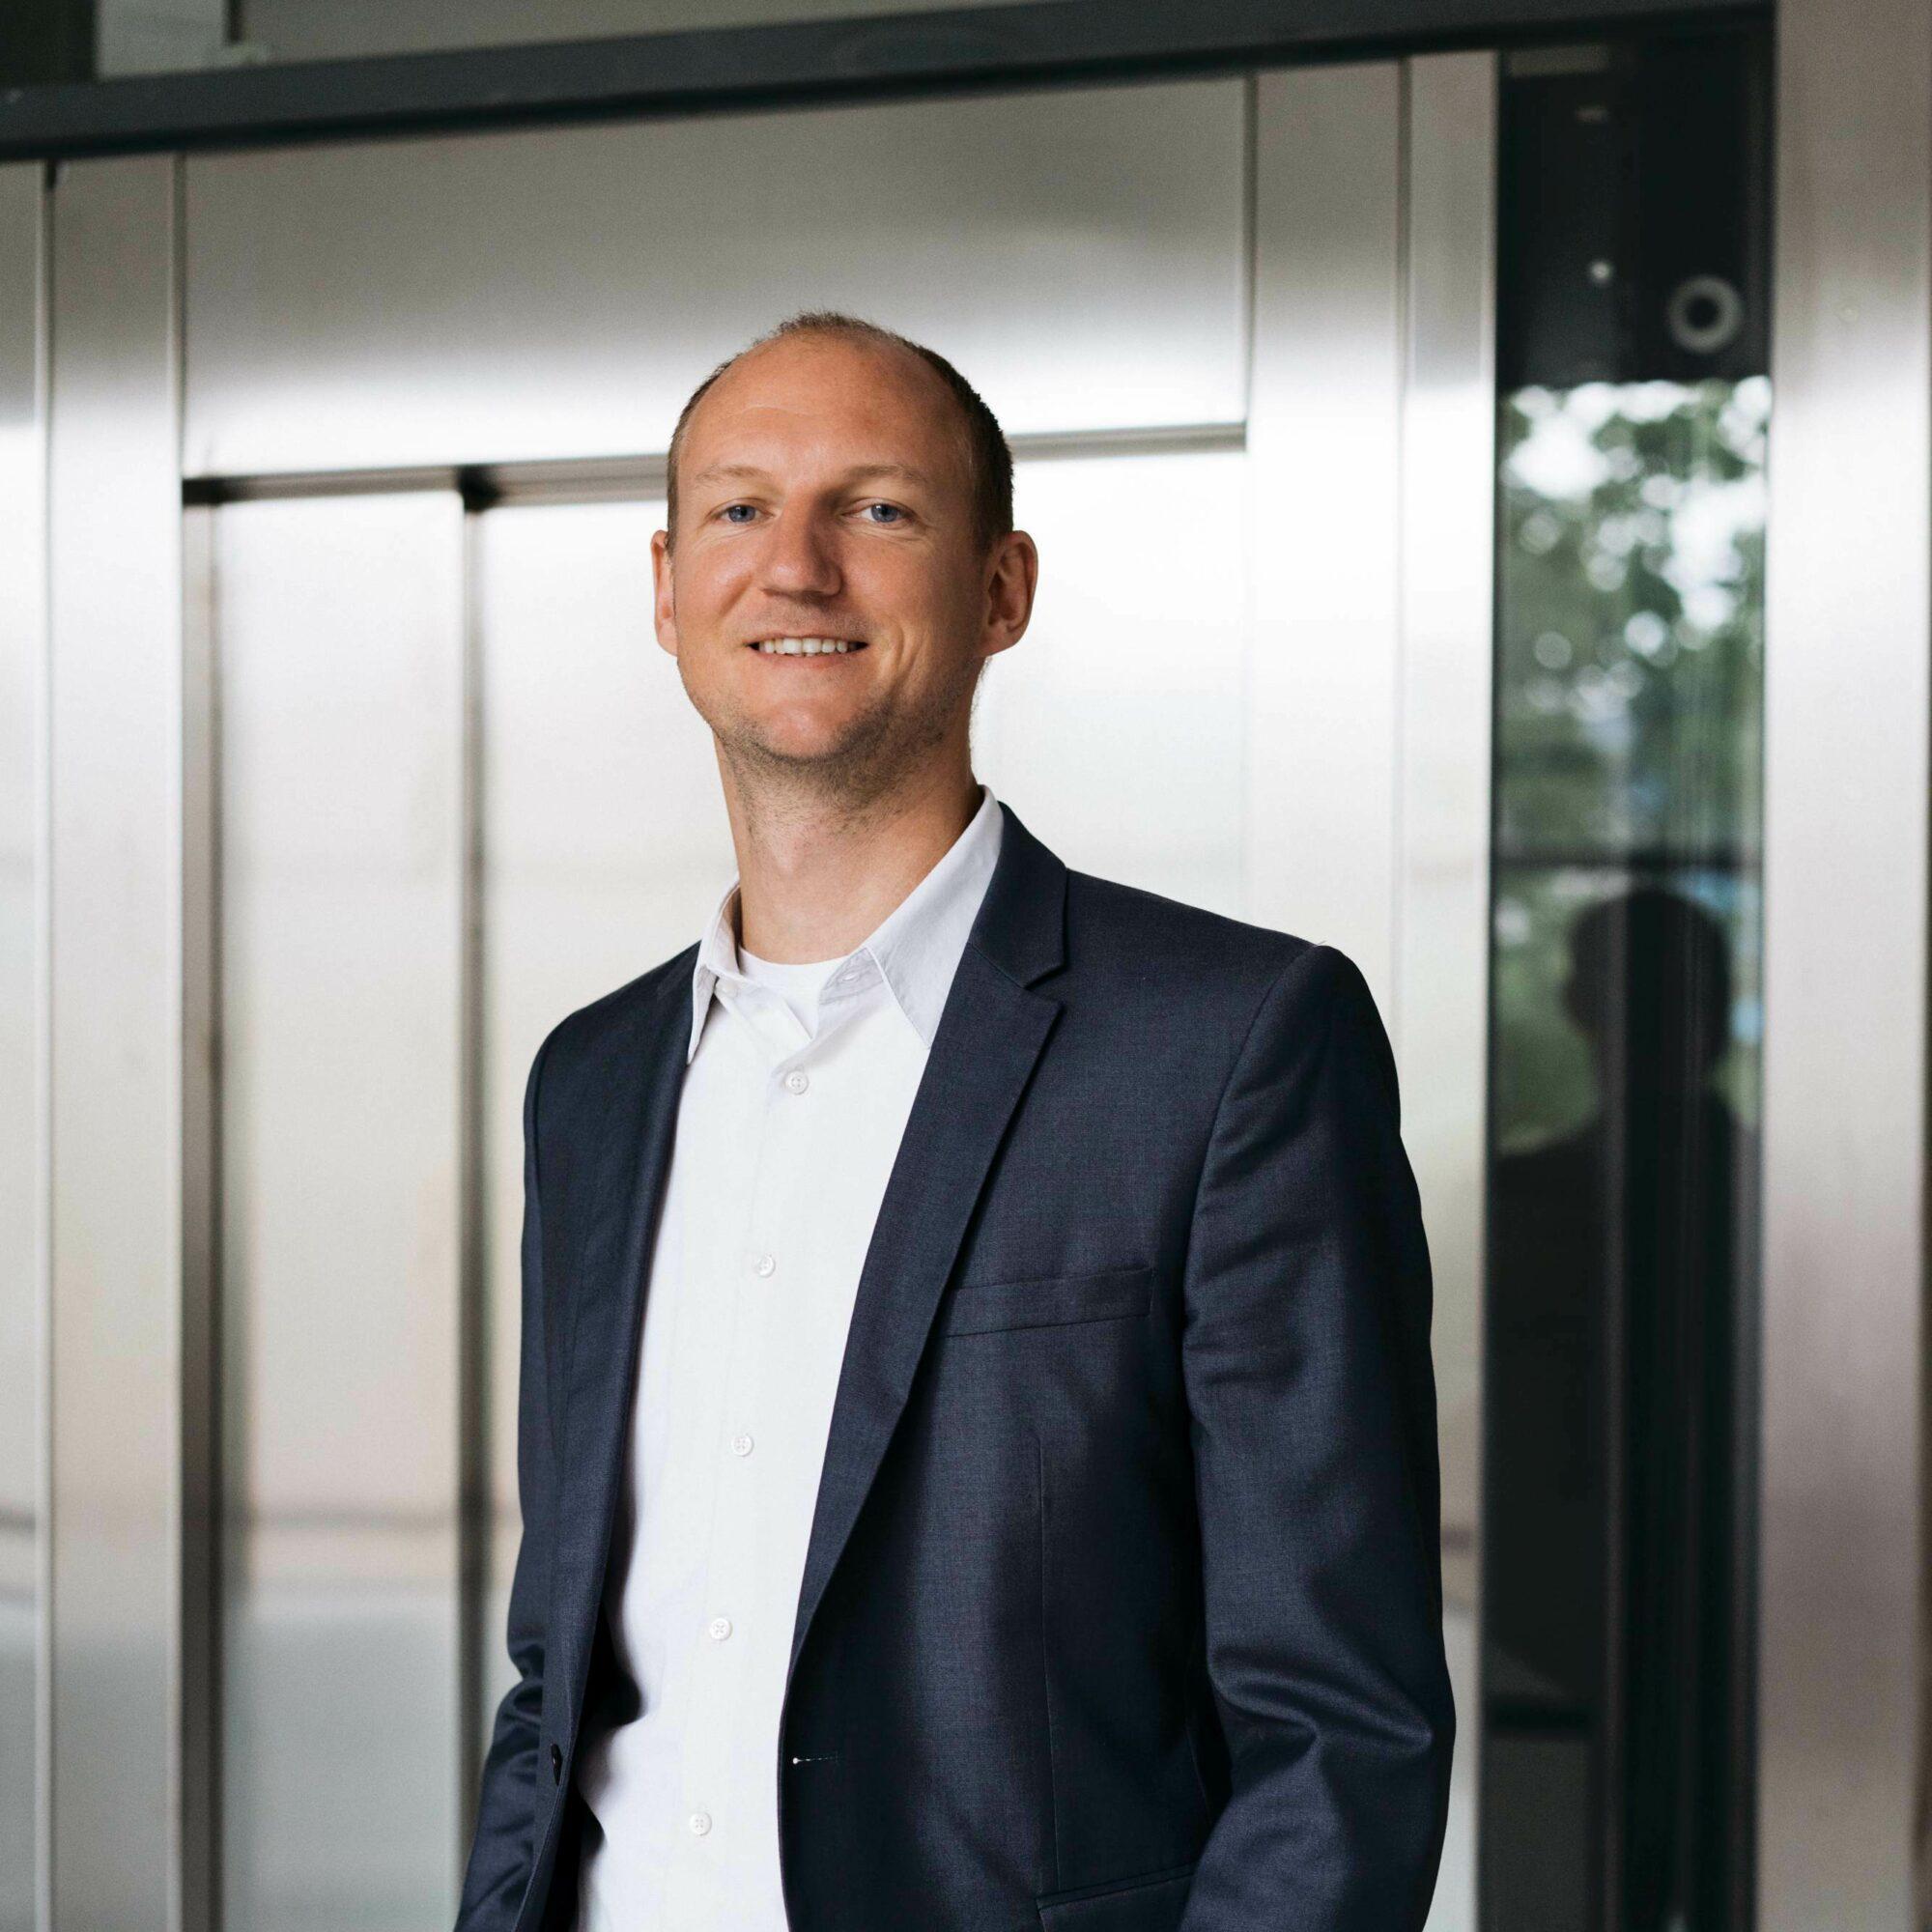 Christof Hieger, CTO, In-Vision Digital Imaging Optics GmbH